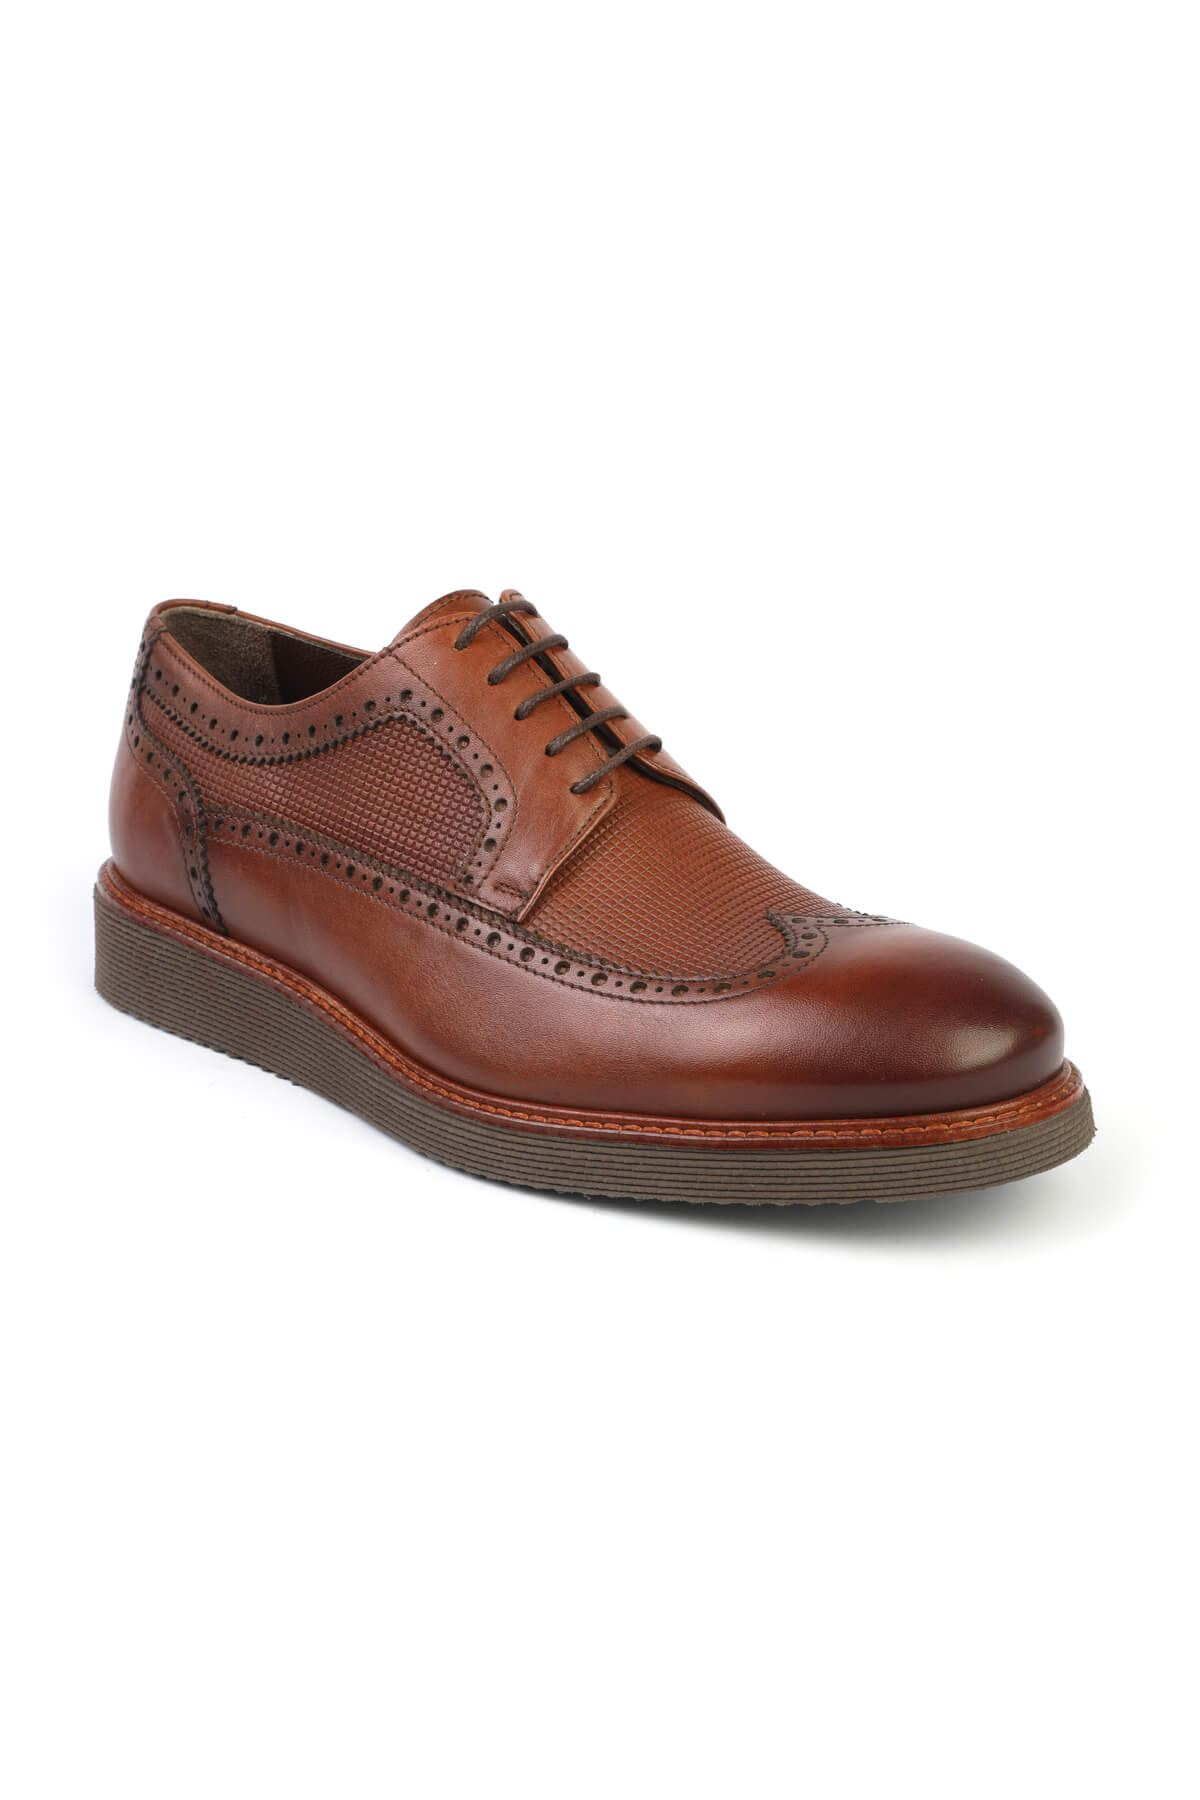 Libero C631 Tan Oxford Shoes